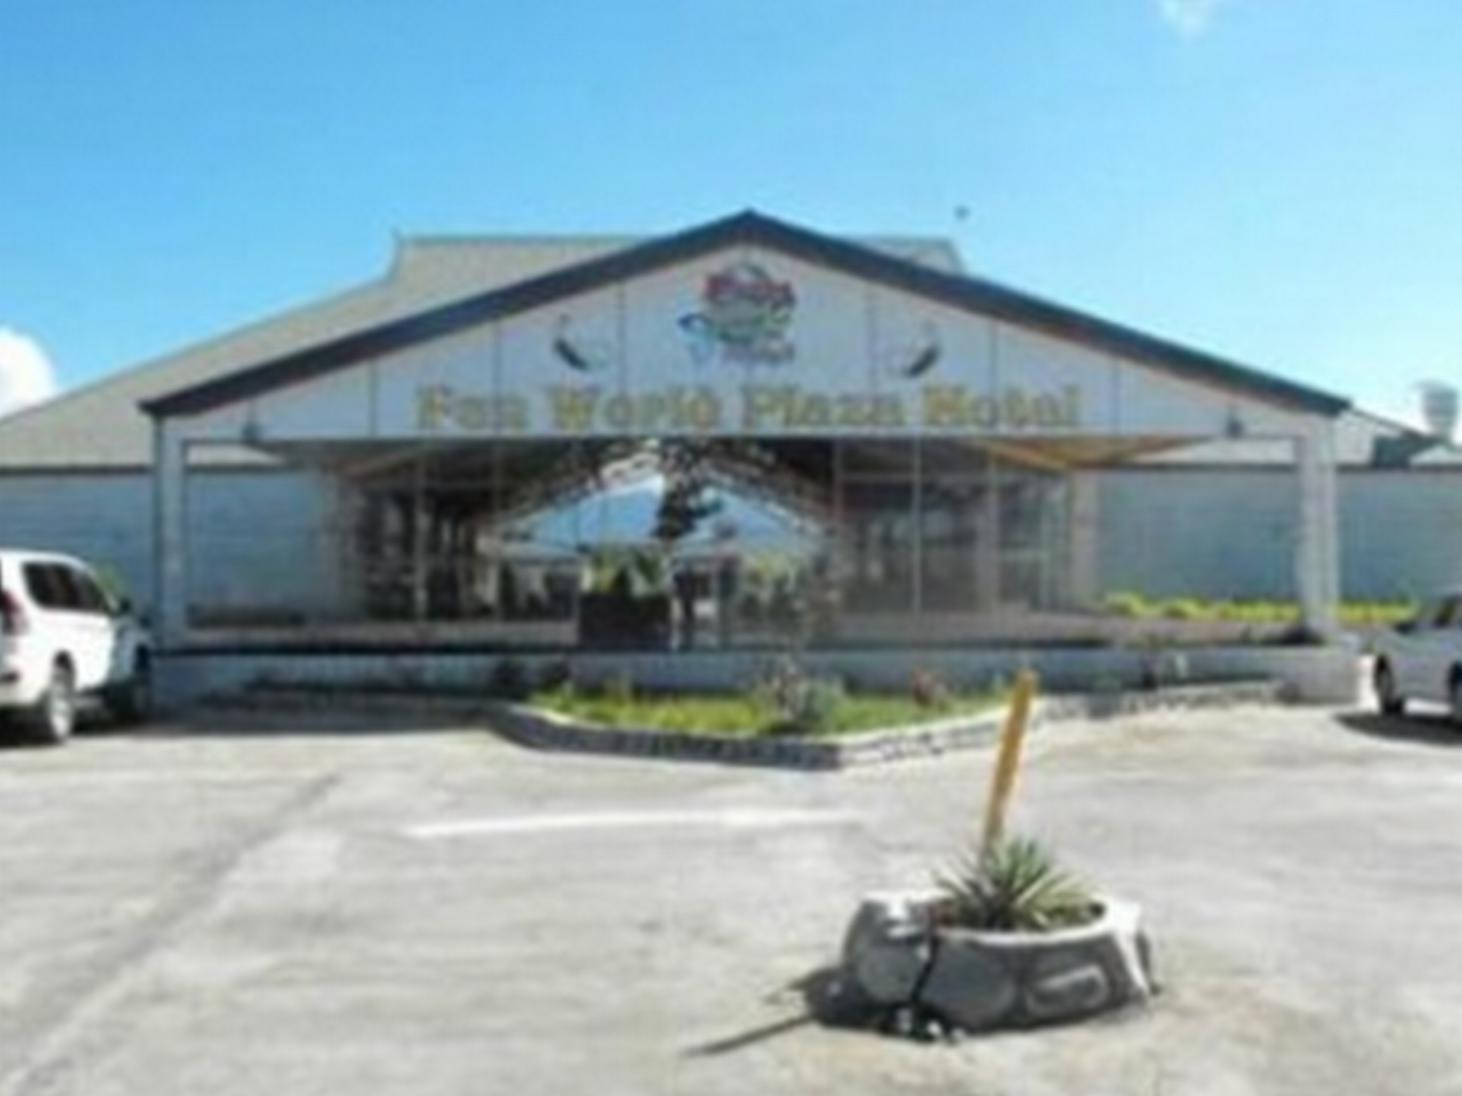 Fun World Plaza Hotel Fiji - Hotels and Accommodation in Fiji, Pacific Ocean And Australia